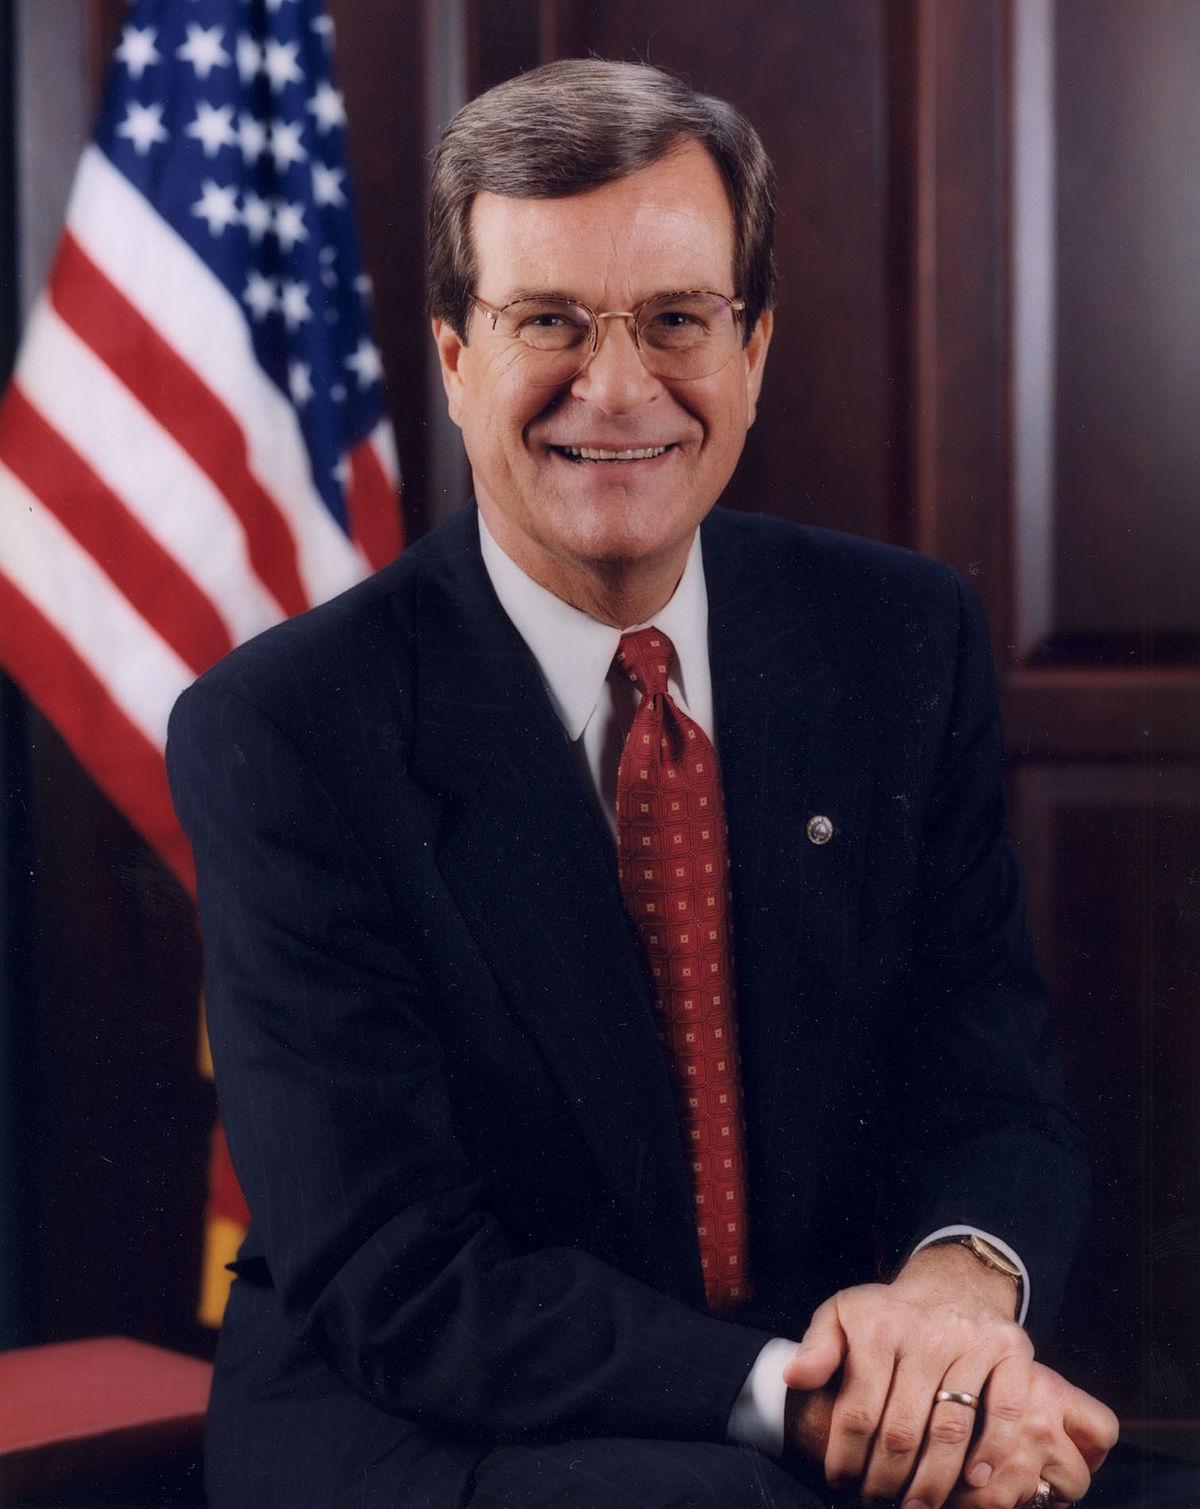 Dick durbin senator family nephew steve